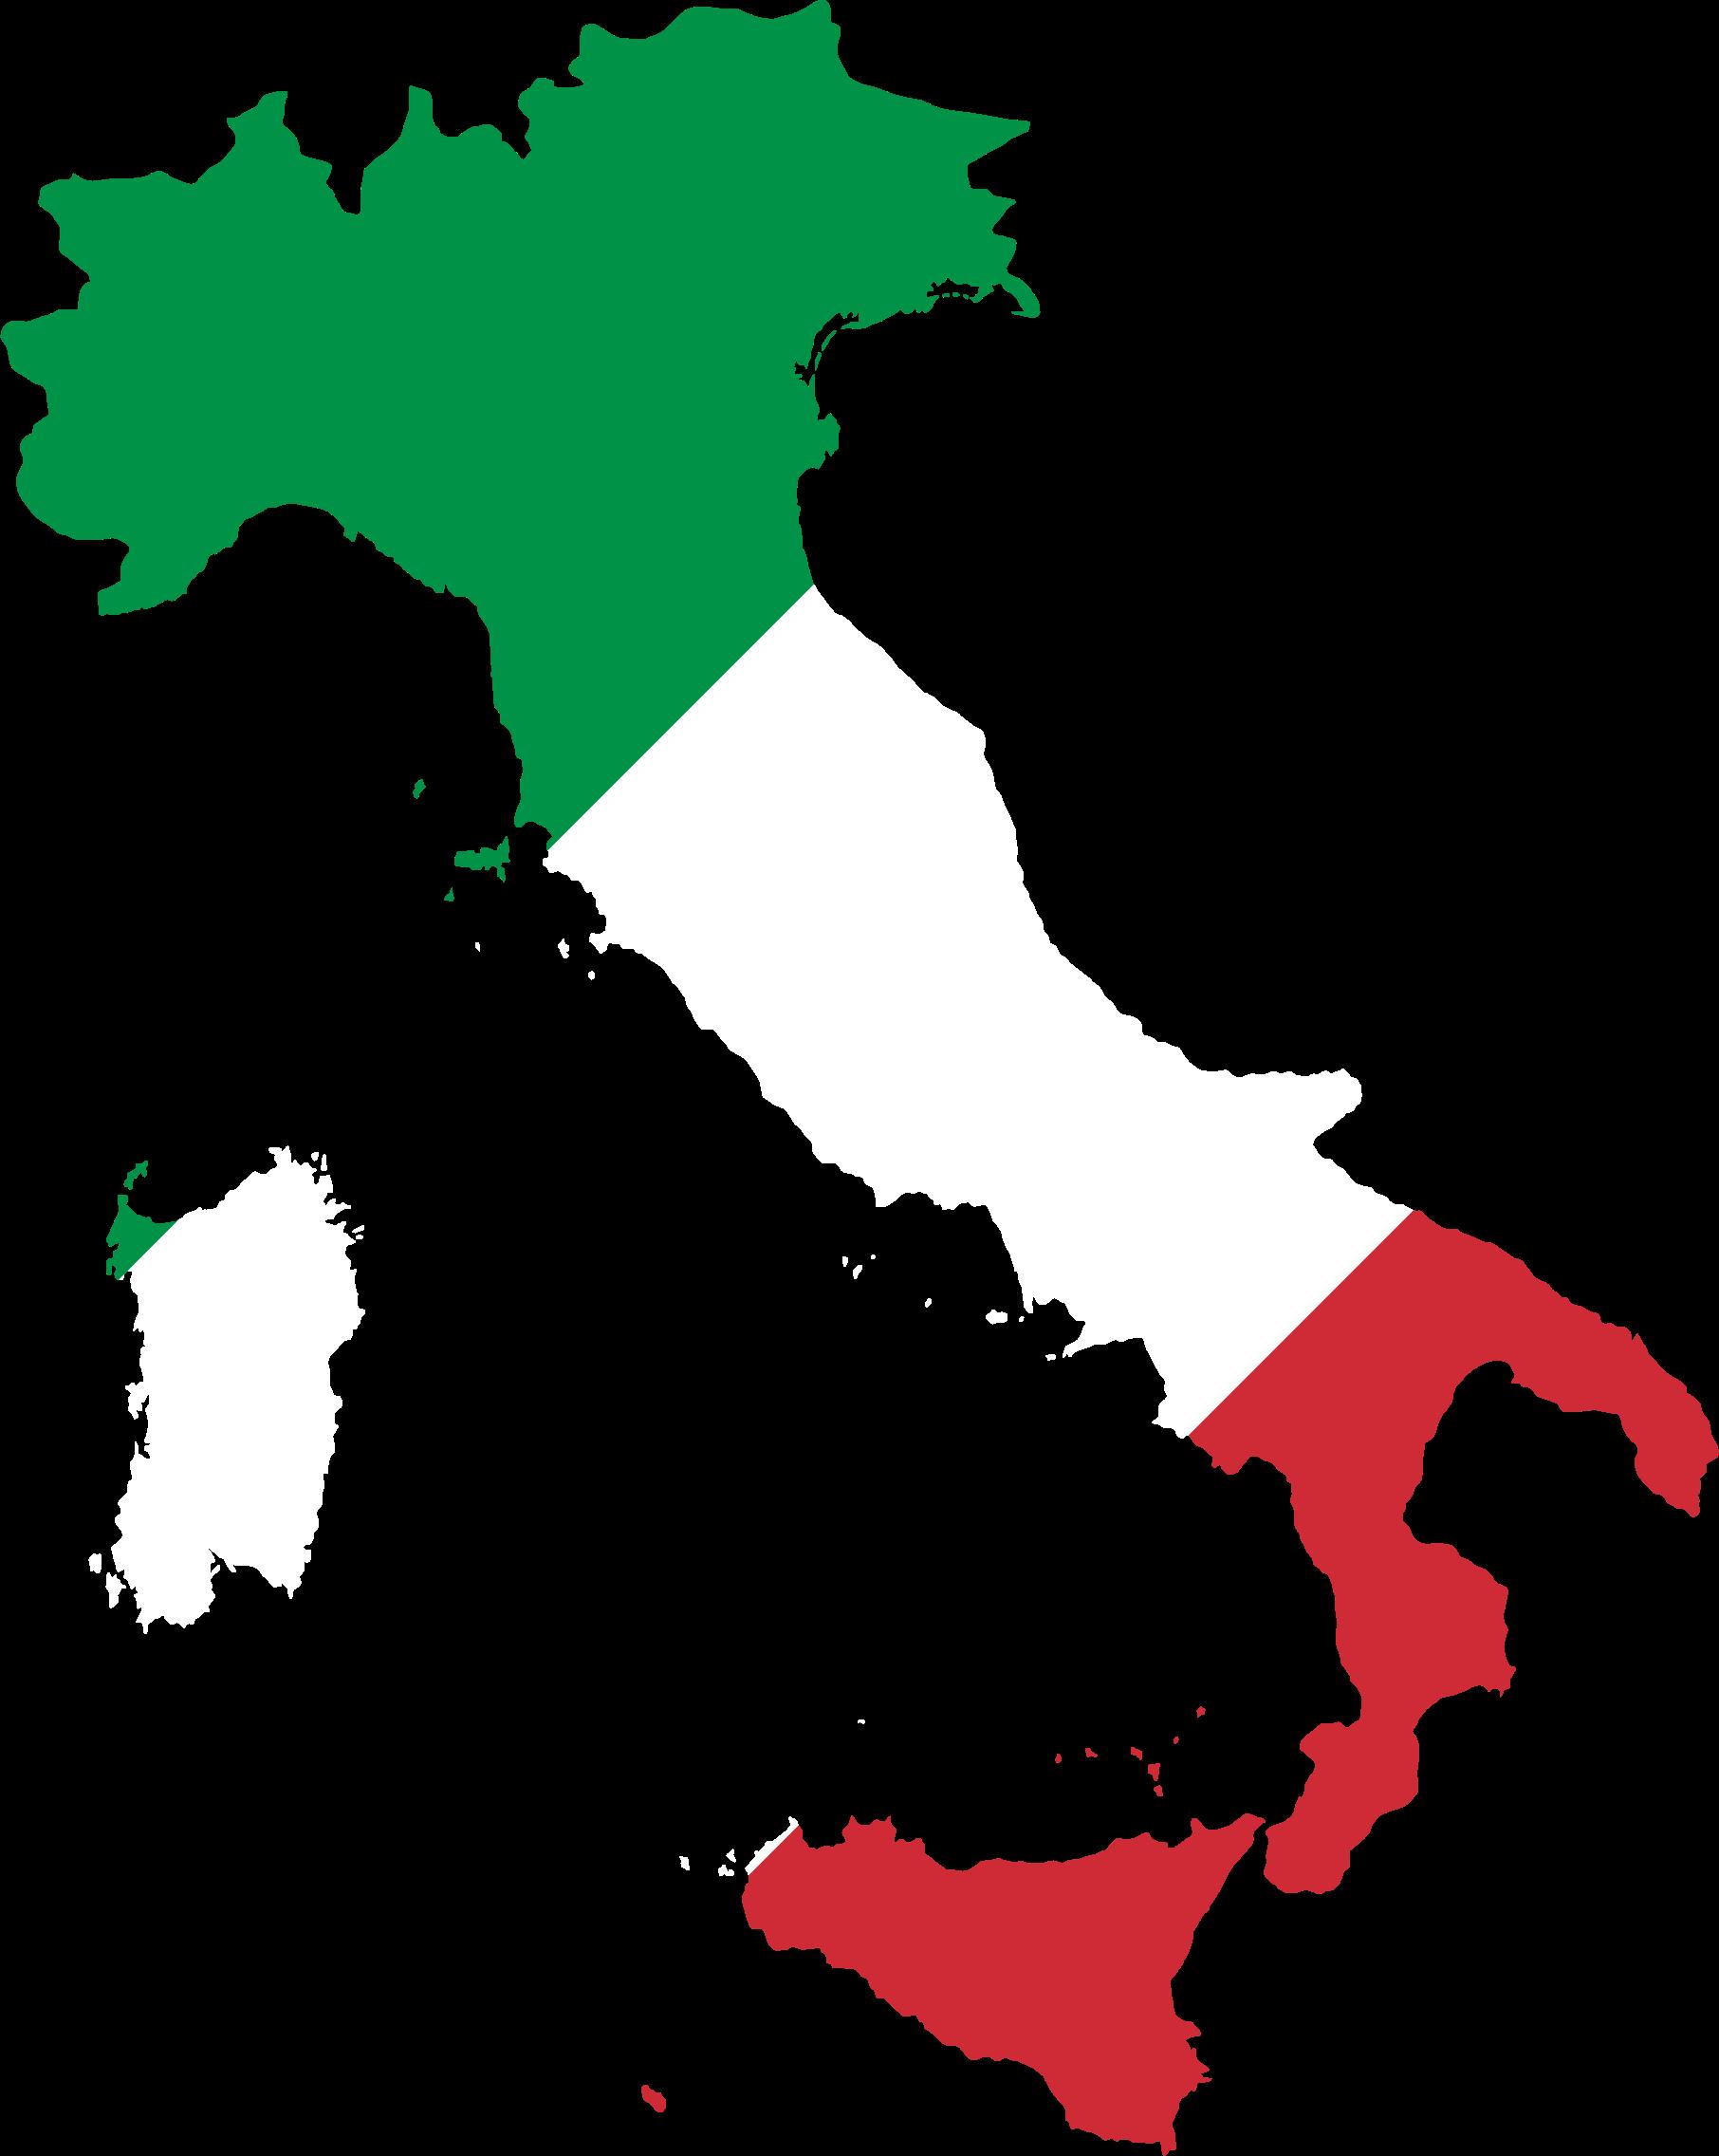 1812x2272 Italy Clipart Italy Map Clipart